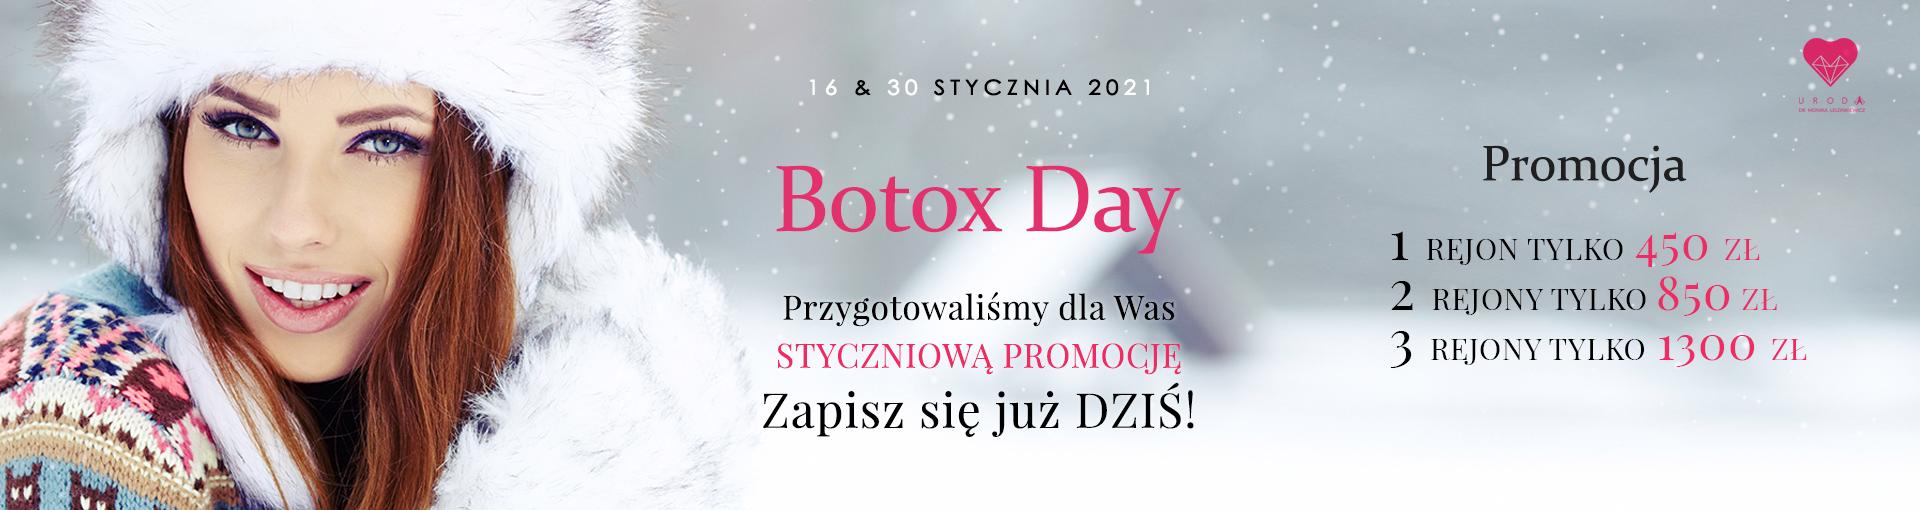 BotoxDay 2020 | LISTOPAD